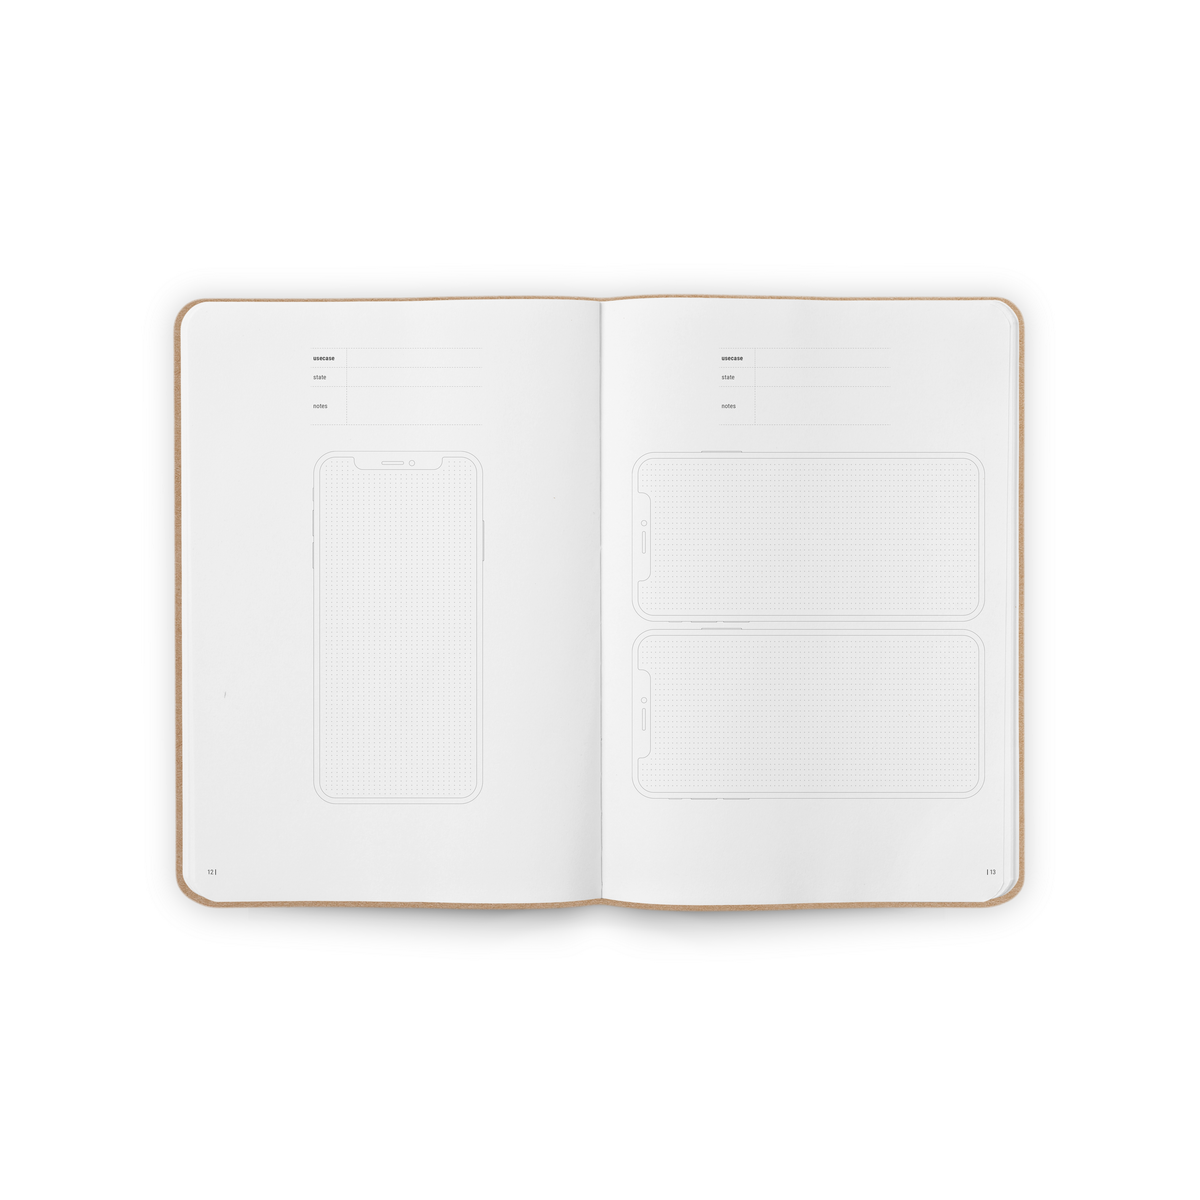 B-115_App-Mockup-Notebook_Stationery_Spread2